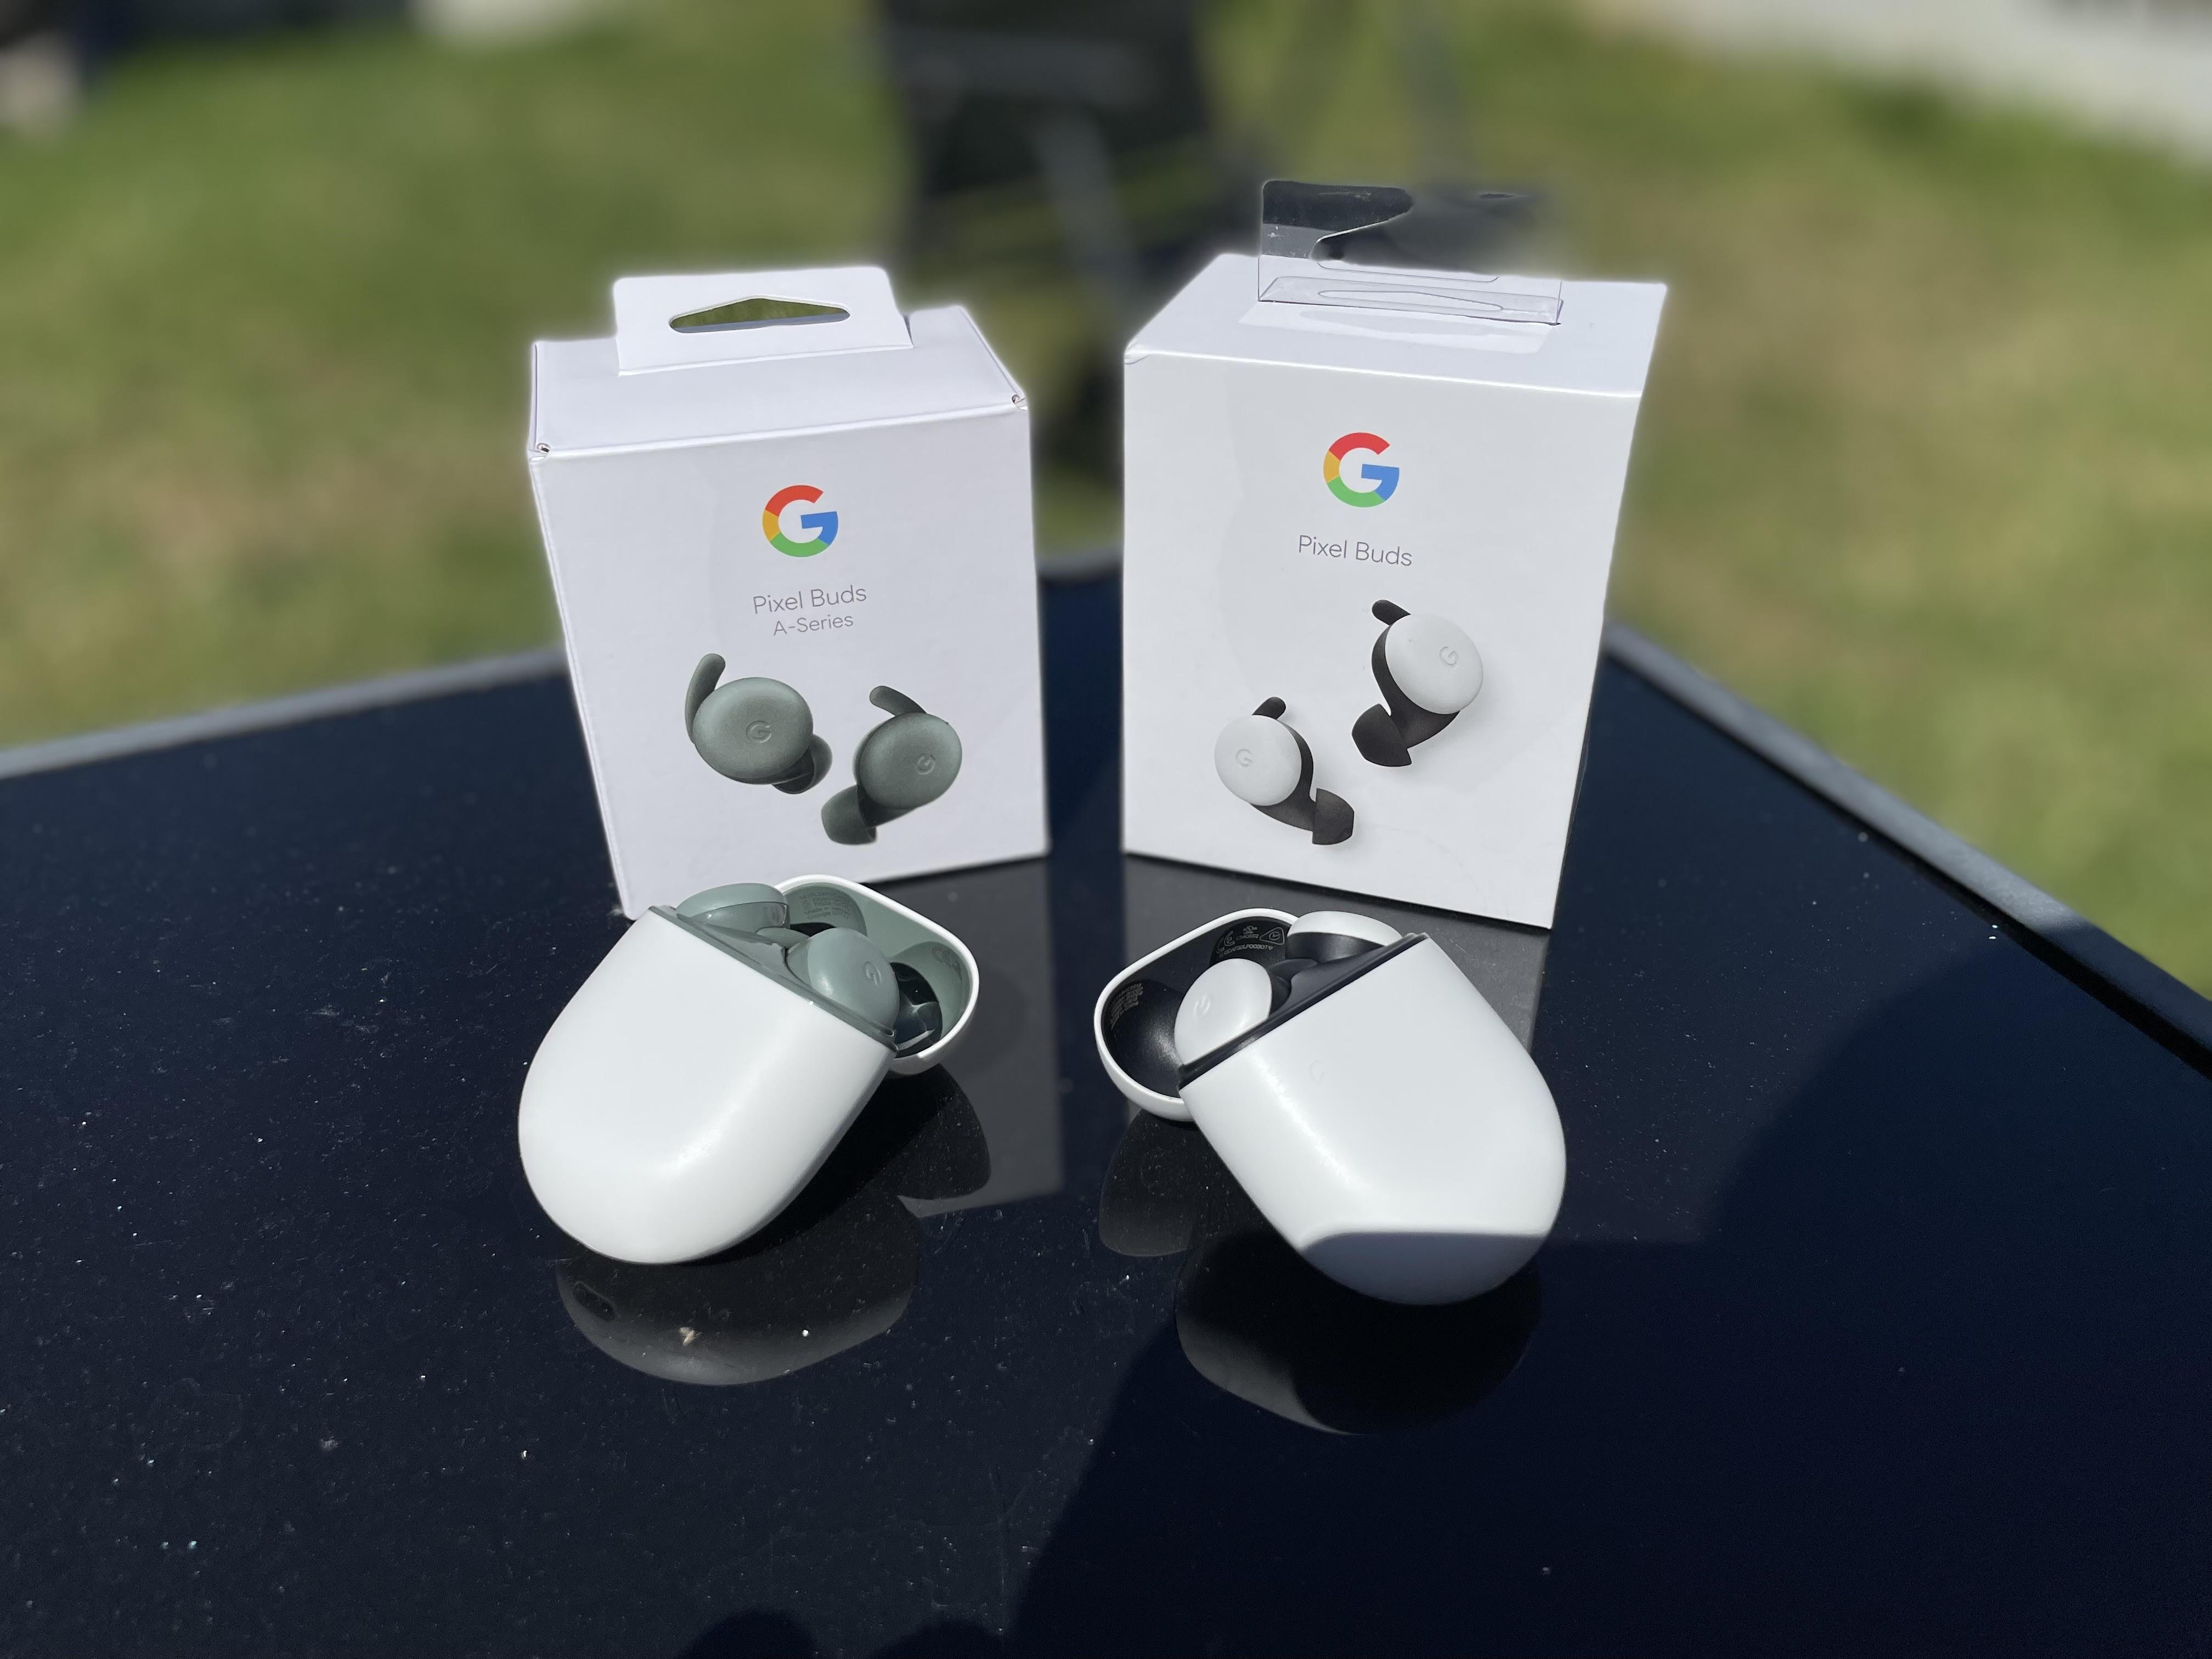 google pixel buds vs pixel buds A-series